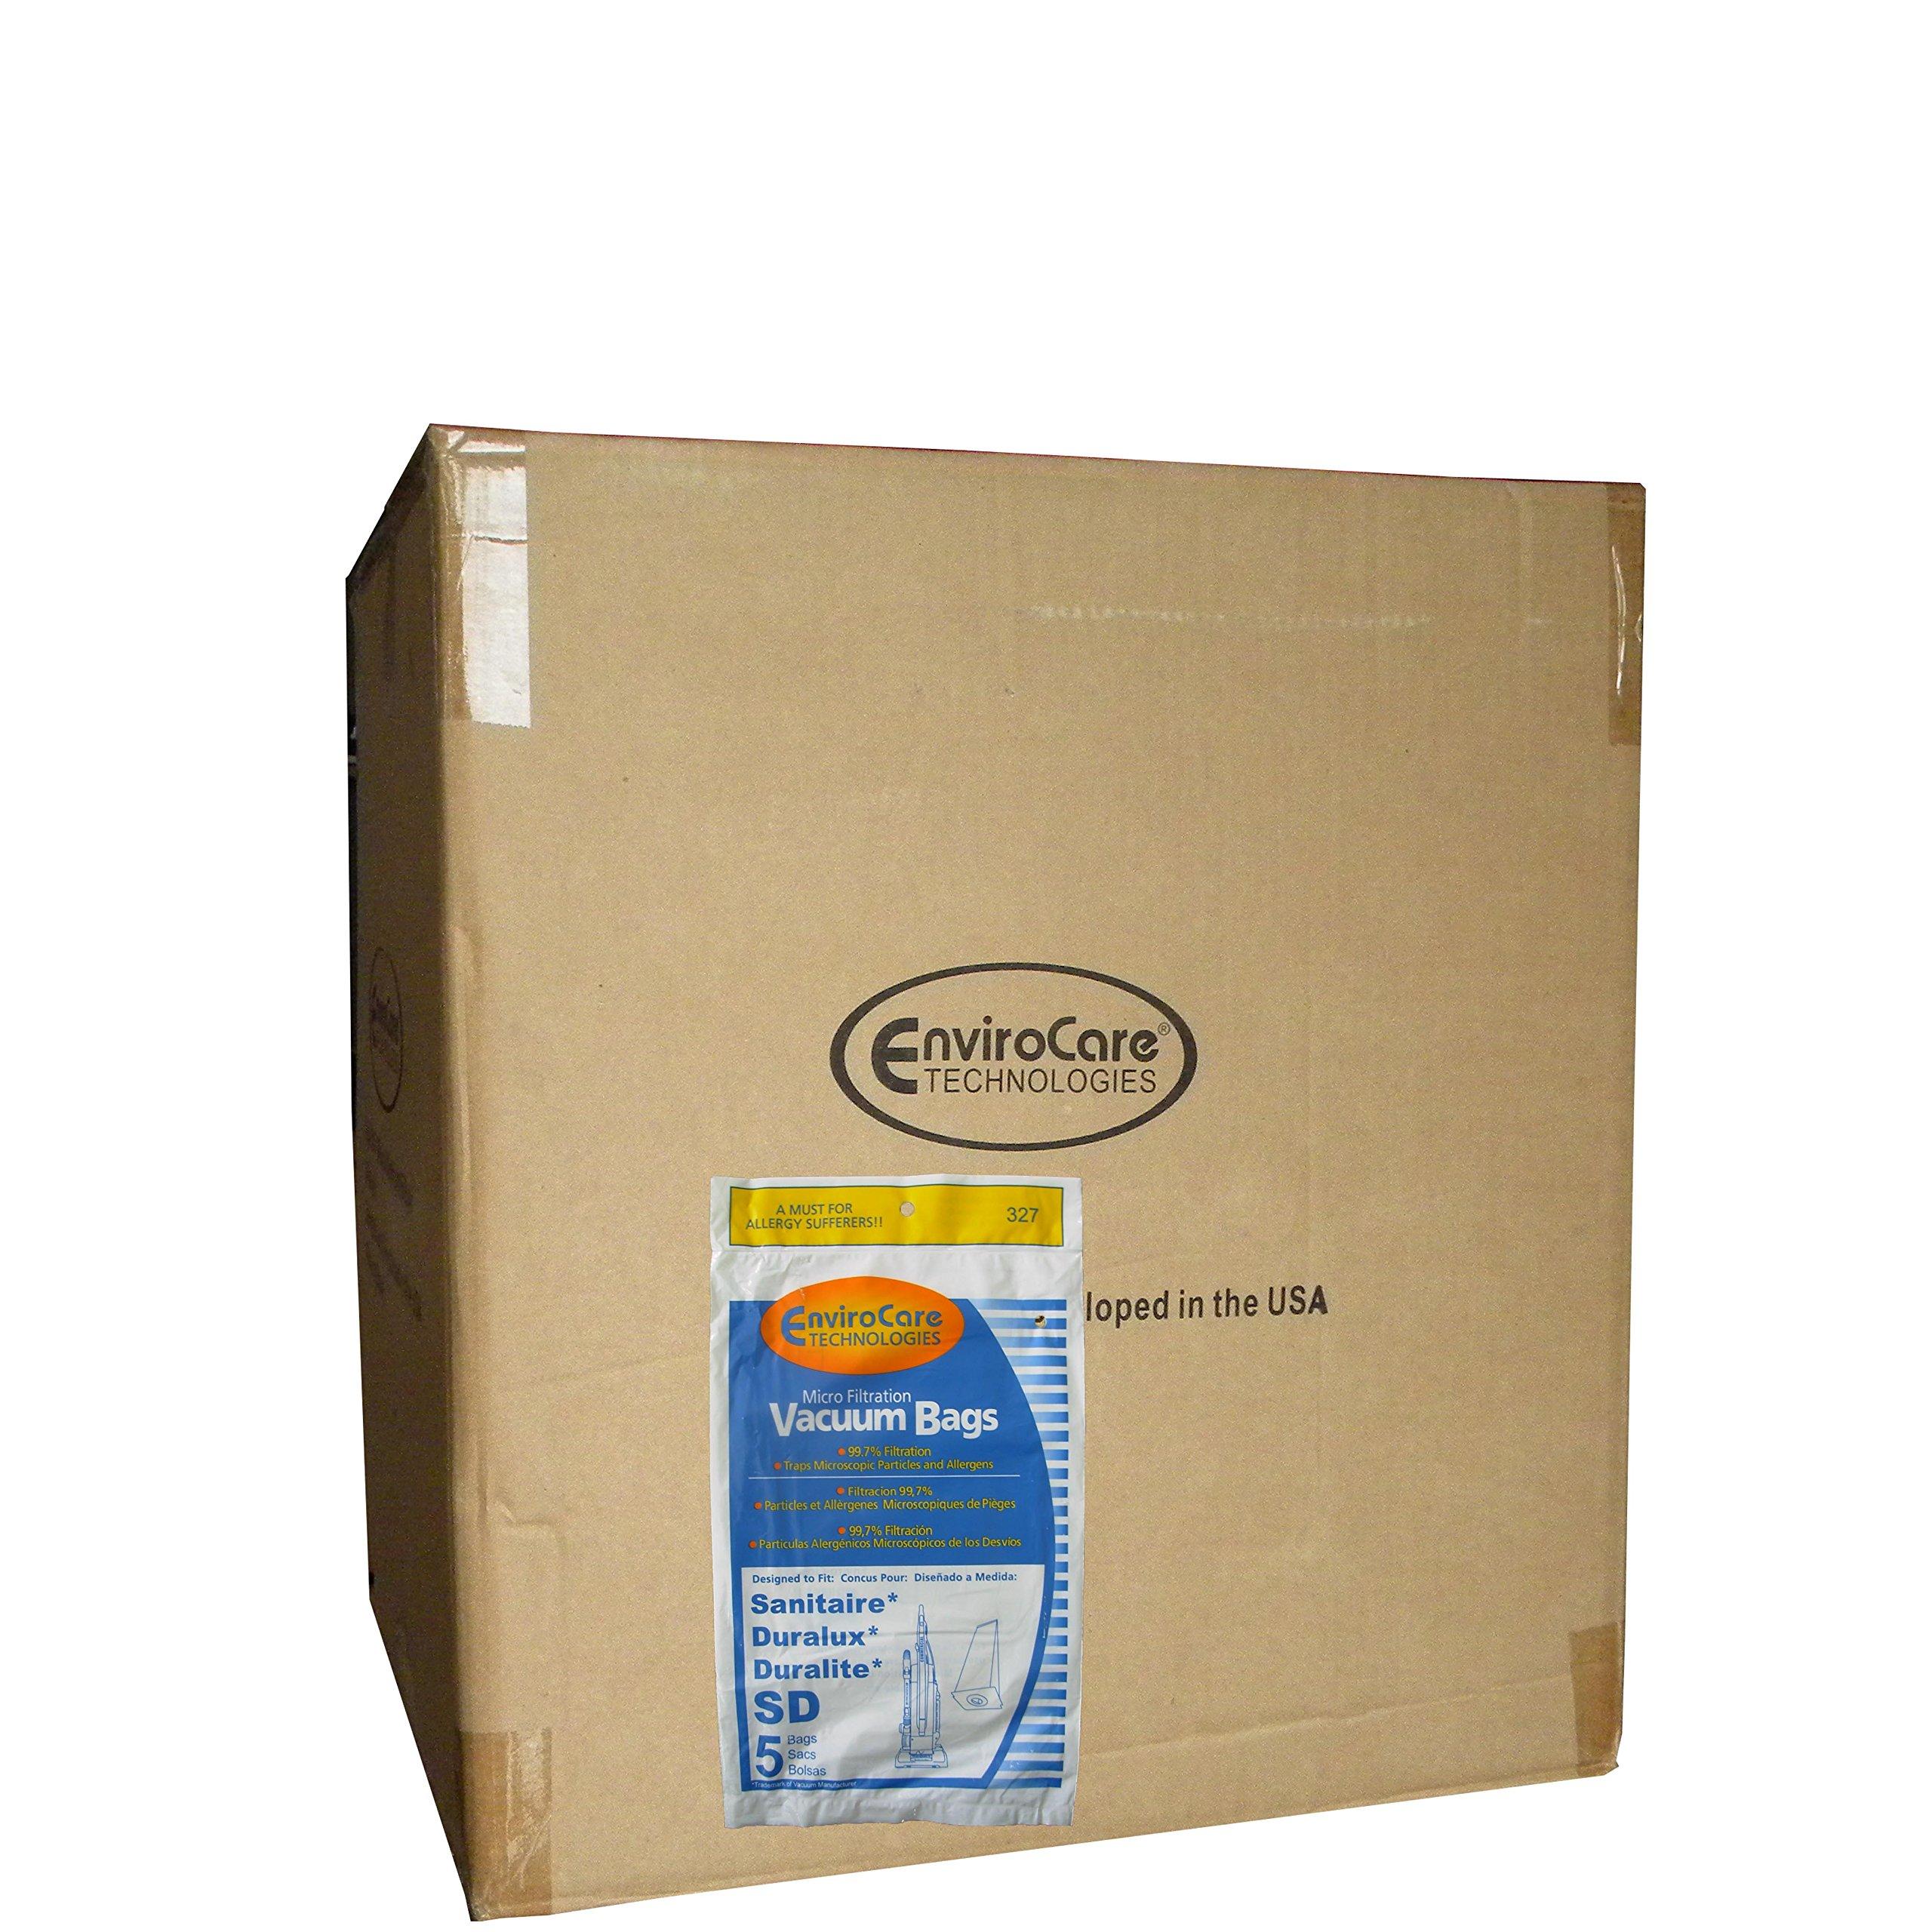 1/2 Case (25 pkgs) Sanitaire Duralux Style SD 63262 Vacuum Cleaner Bags Models Electolux Upright, Commercial Upright, DuraLux Professional, ProSense X2 Upright